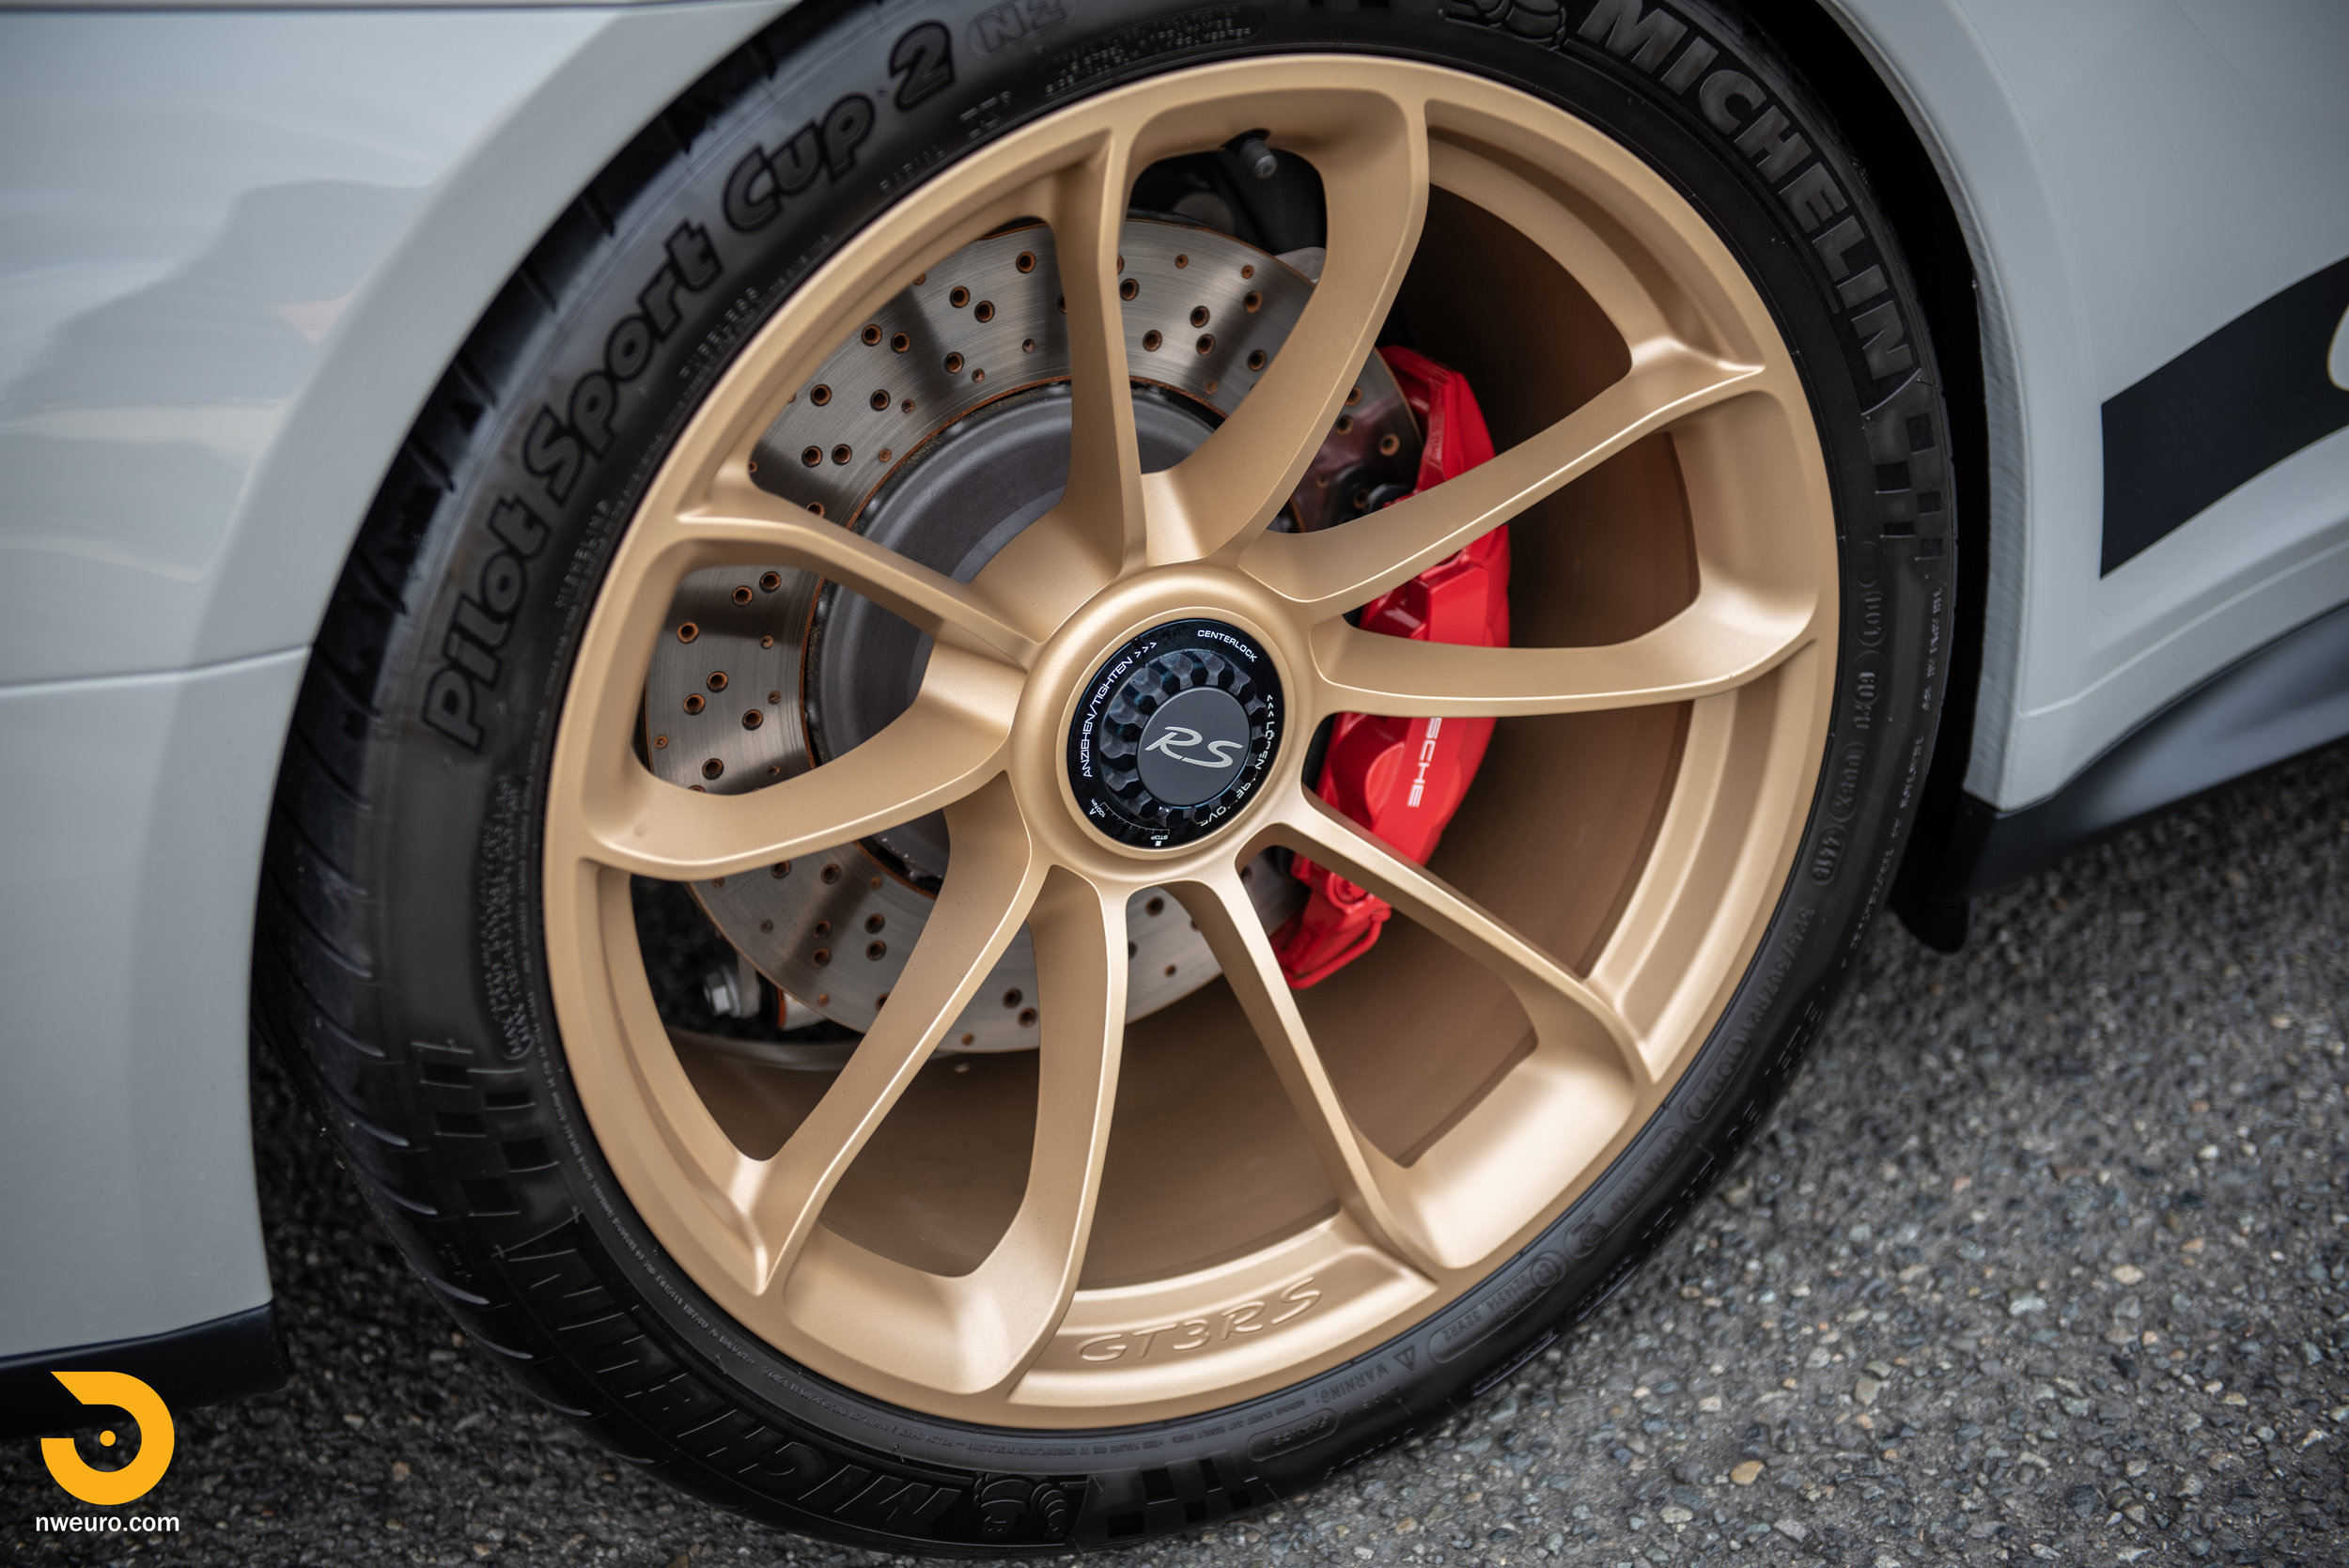 2019 Porsche GT3 RS - Chalk-3.jpg